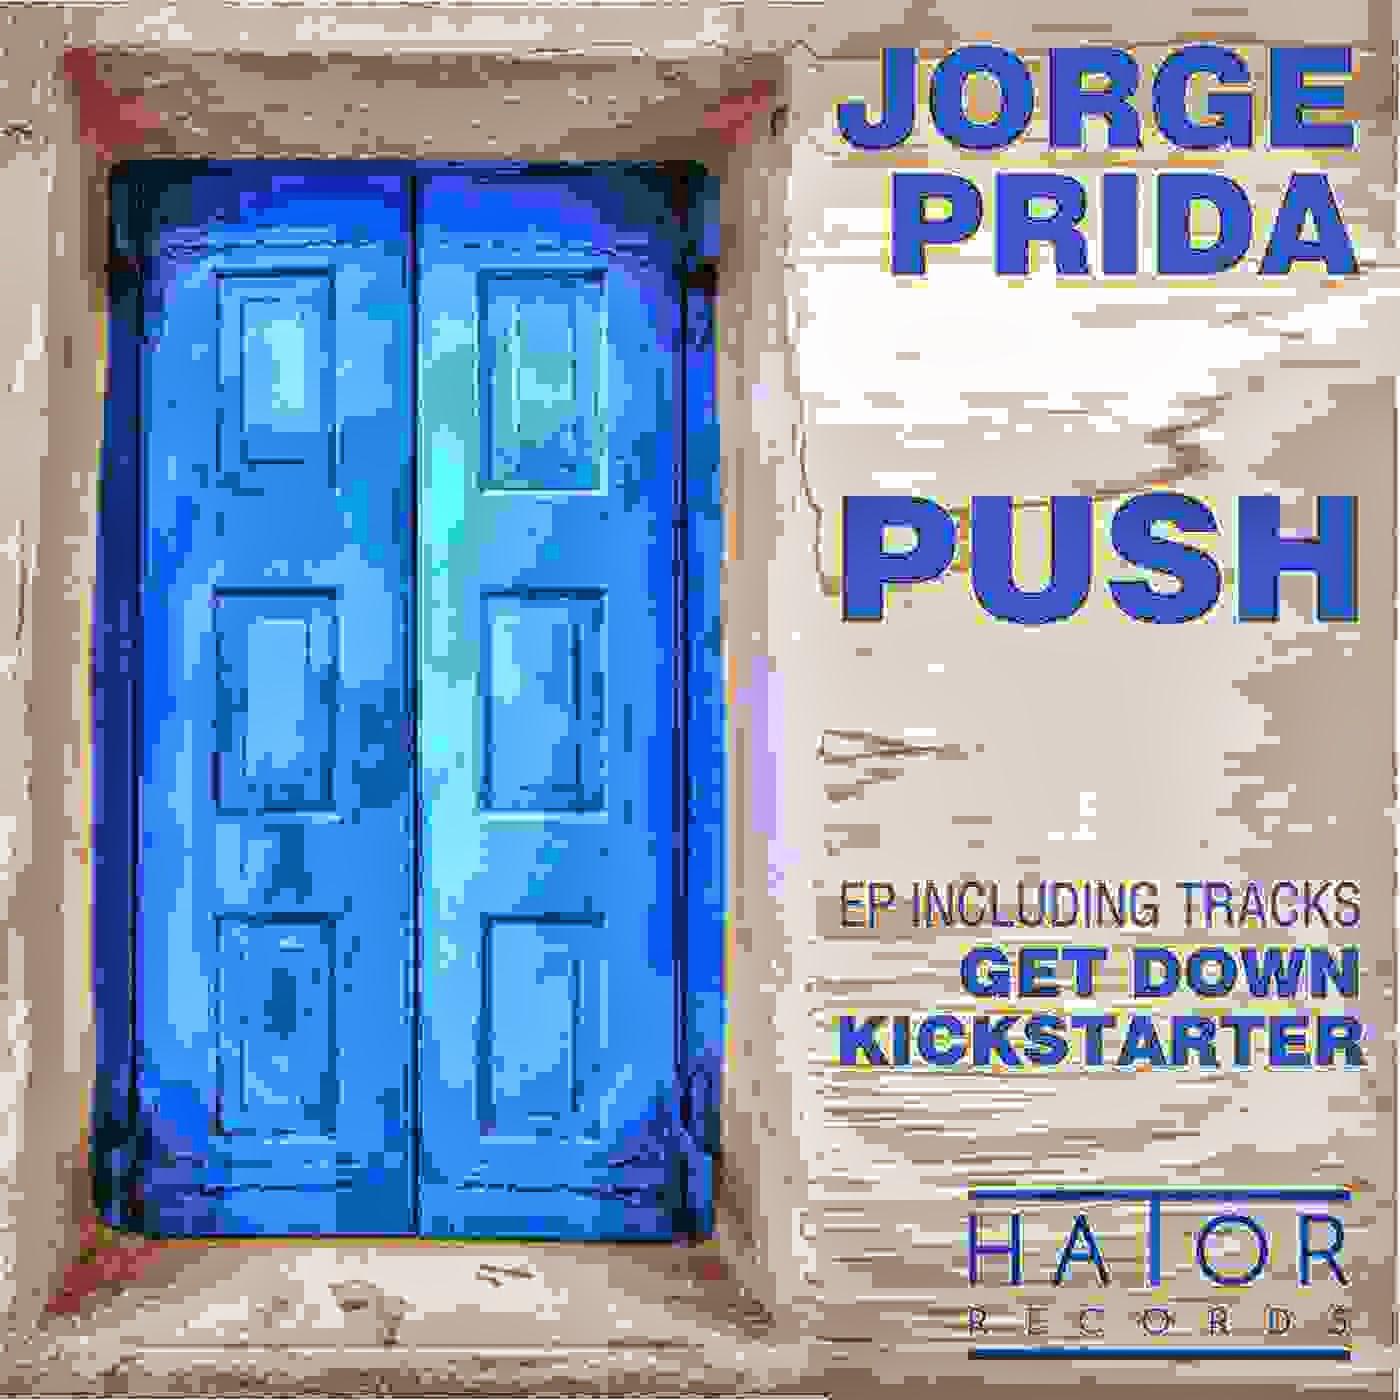 Jorge Prida - Push EP